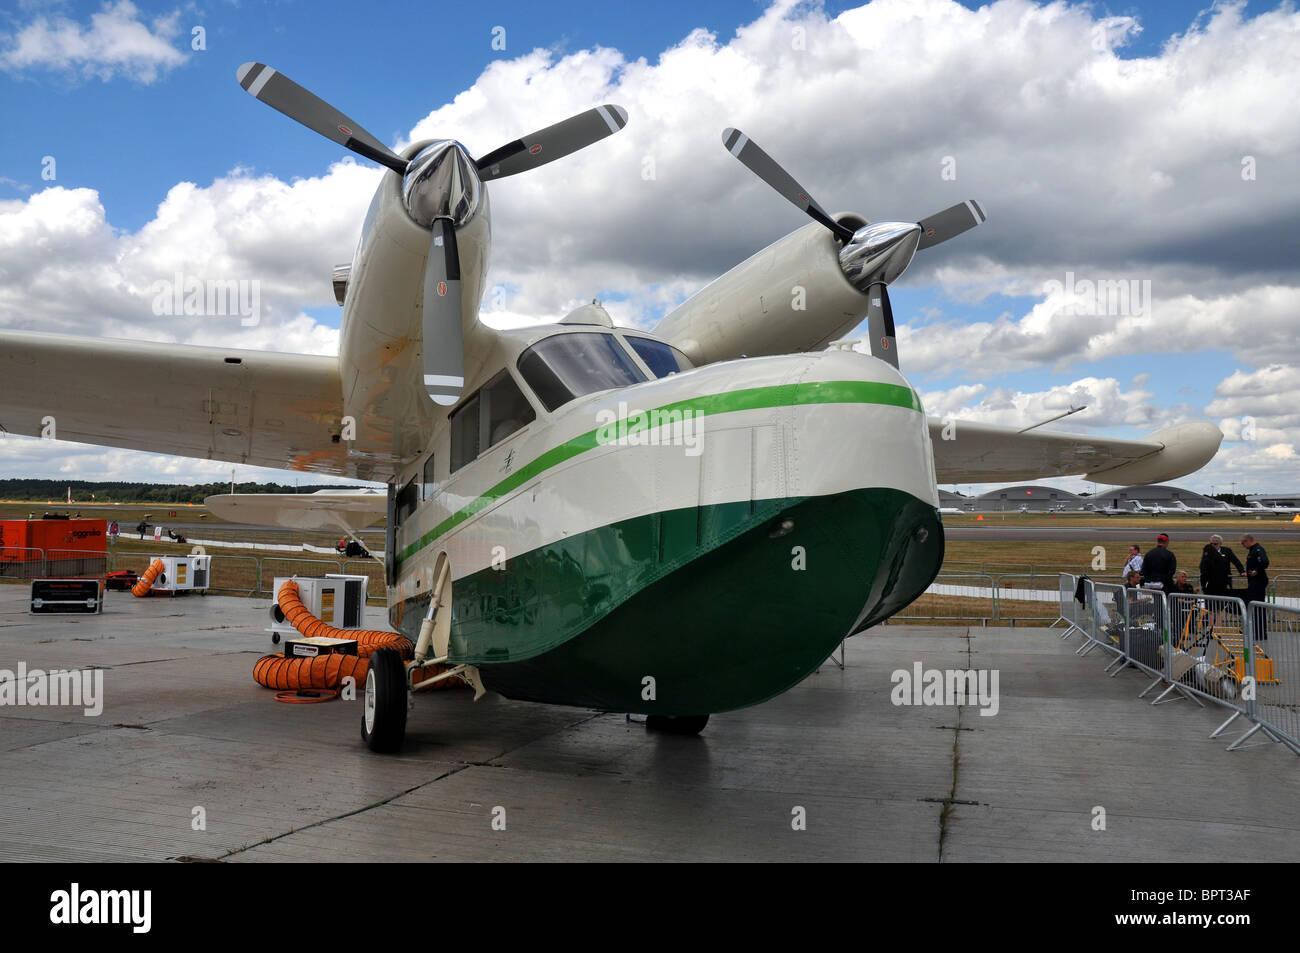 Grummen flying boat - Stock Image